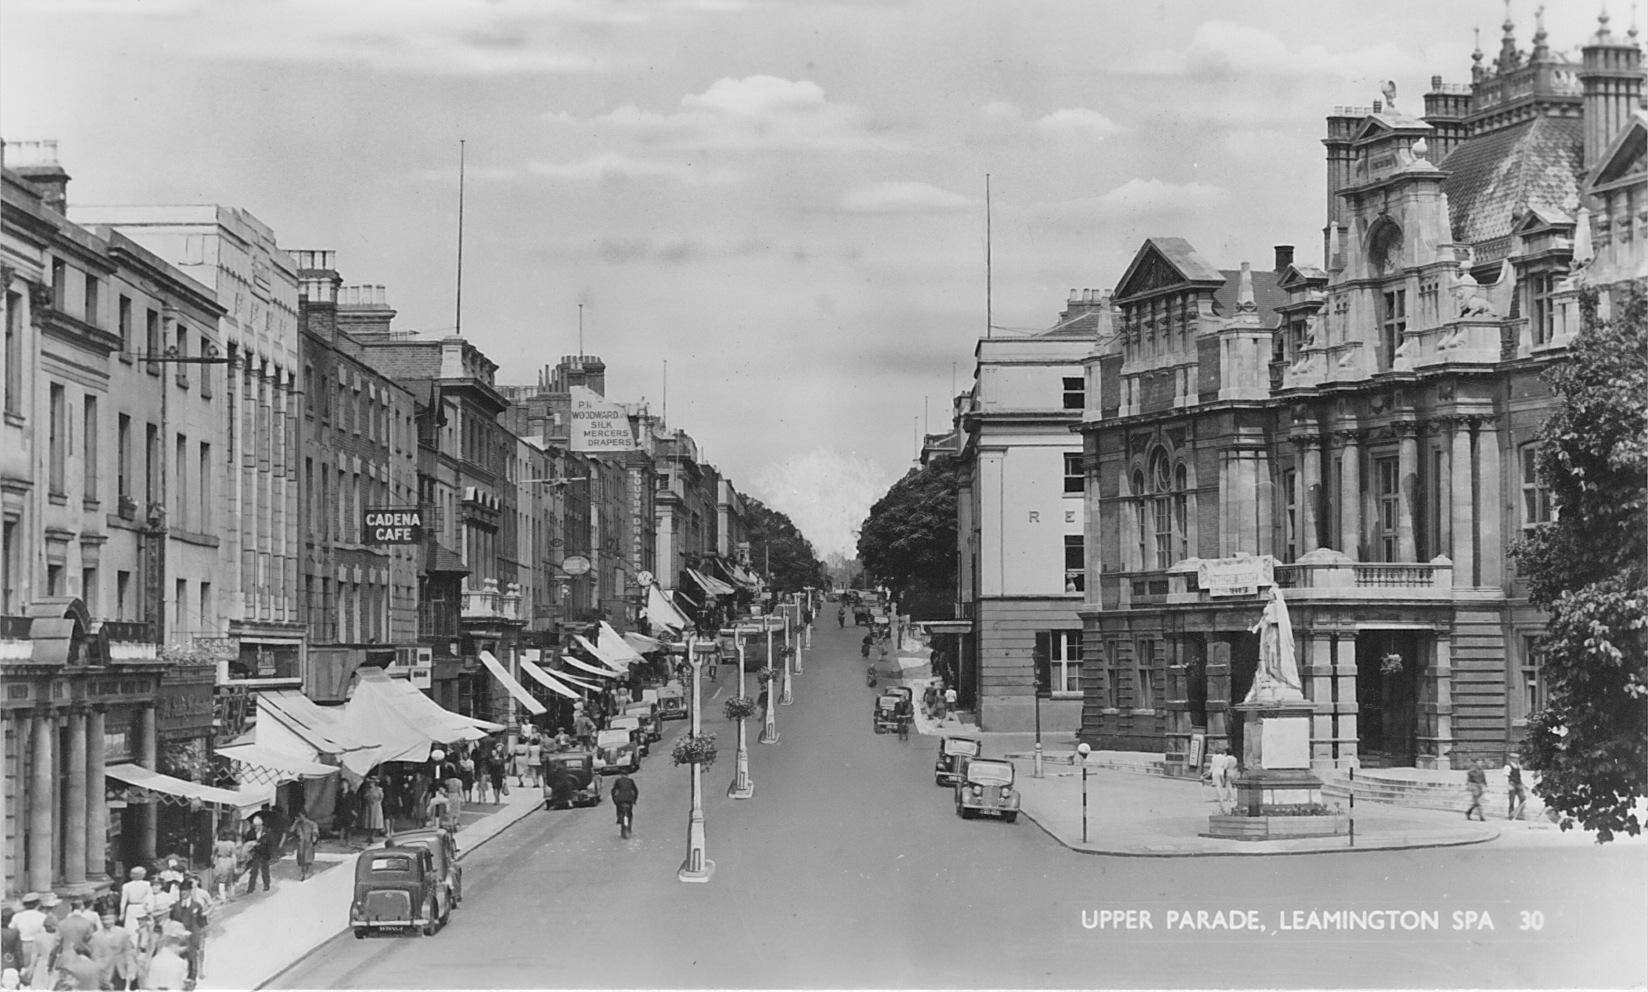 The Parade, 1950s